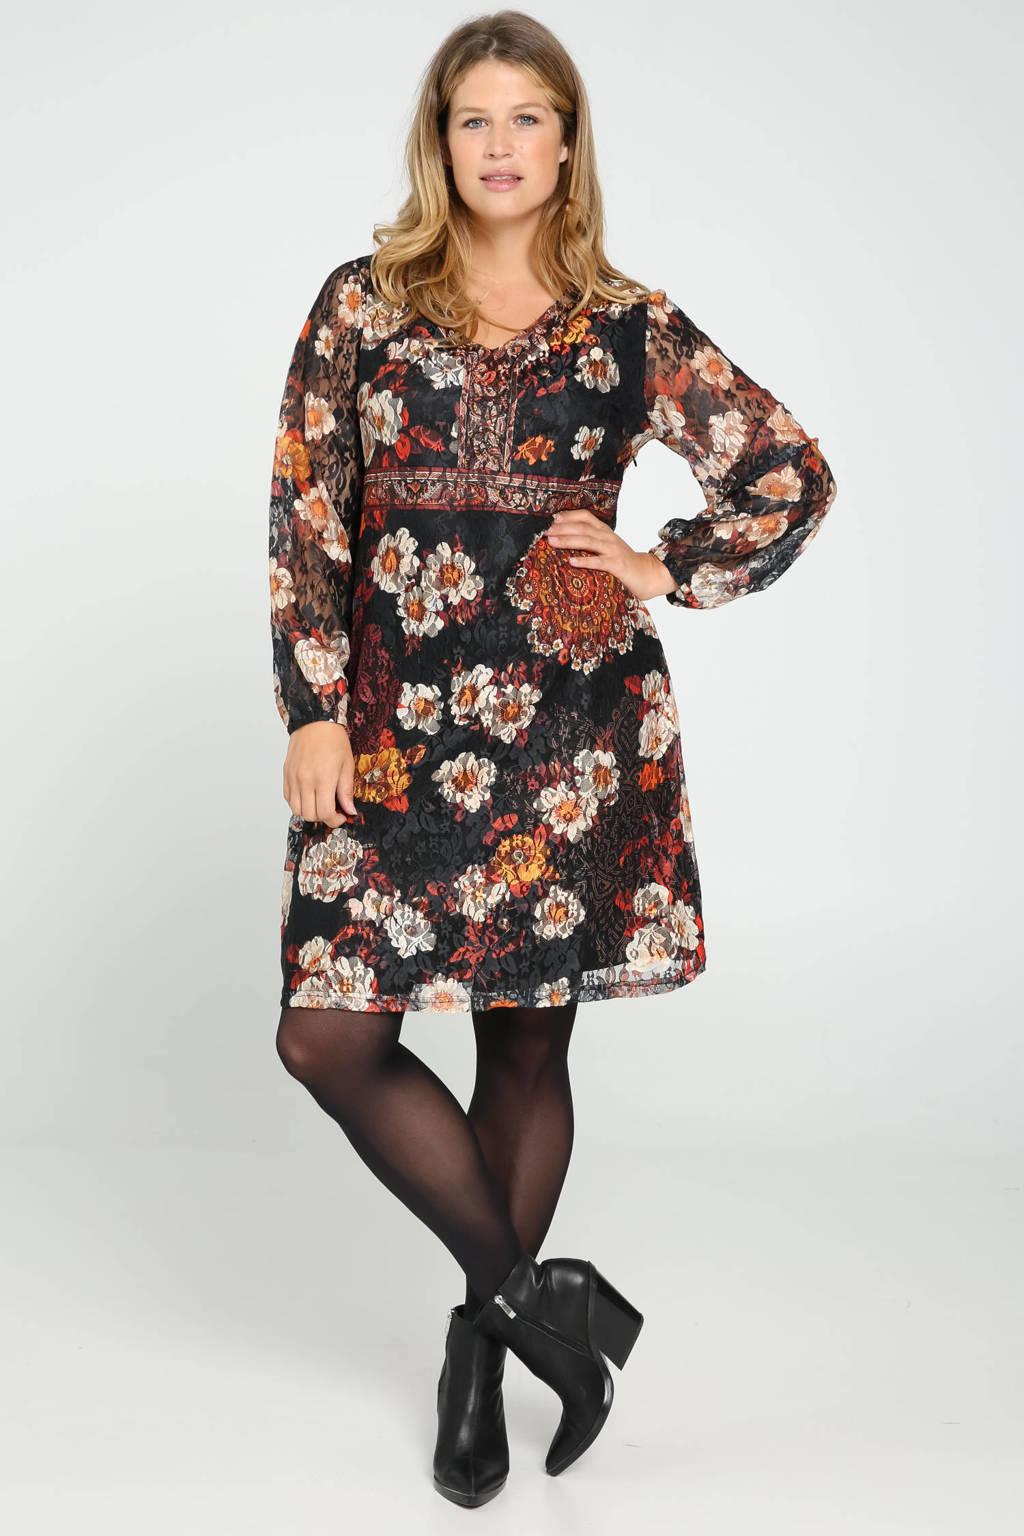 Paprika gebloemde jurk zwart/multi, Zwart/multi